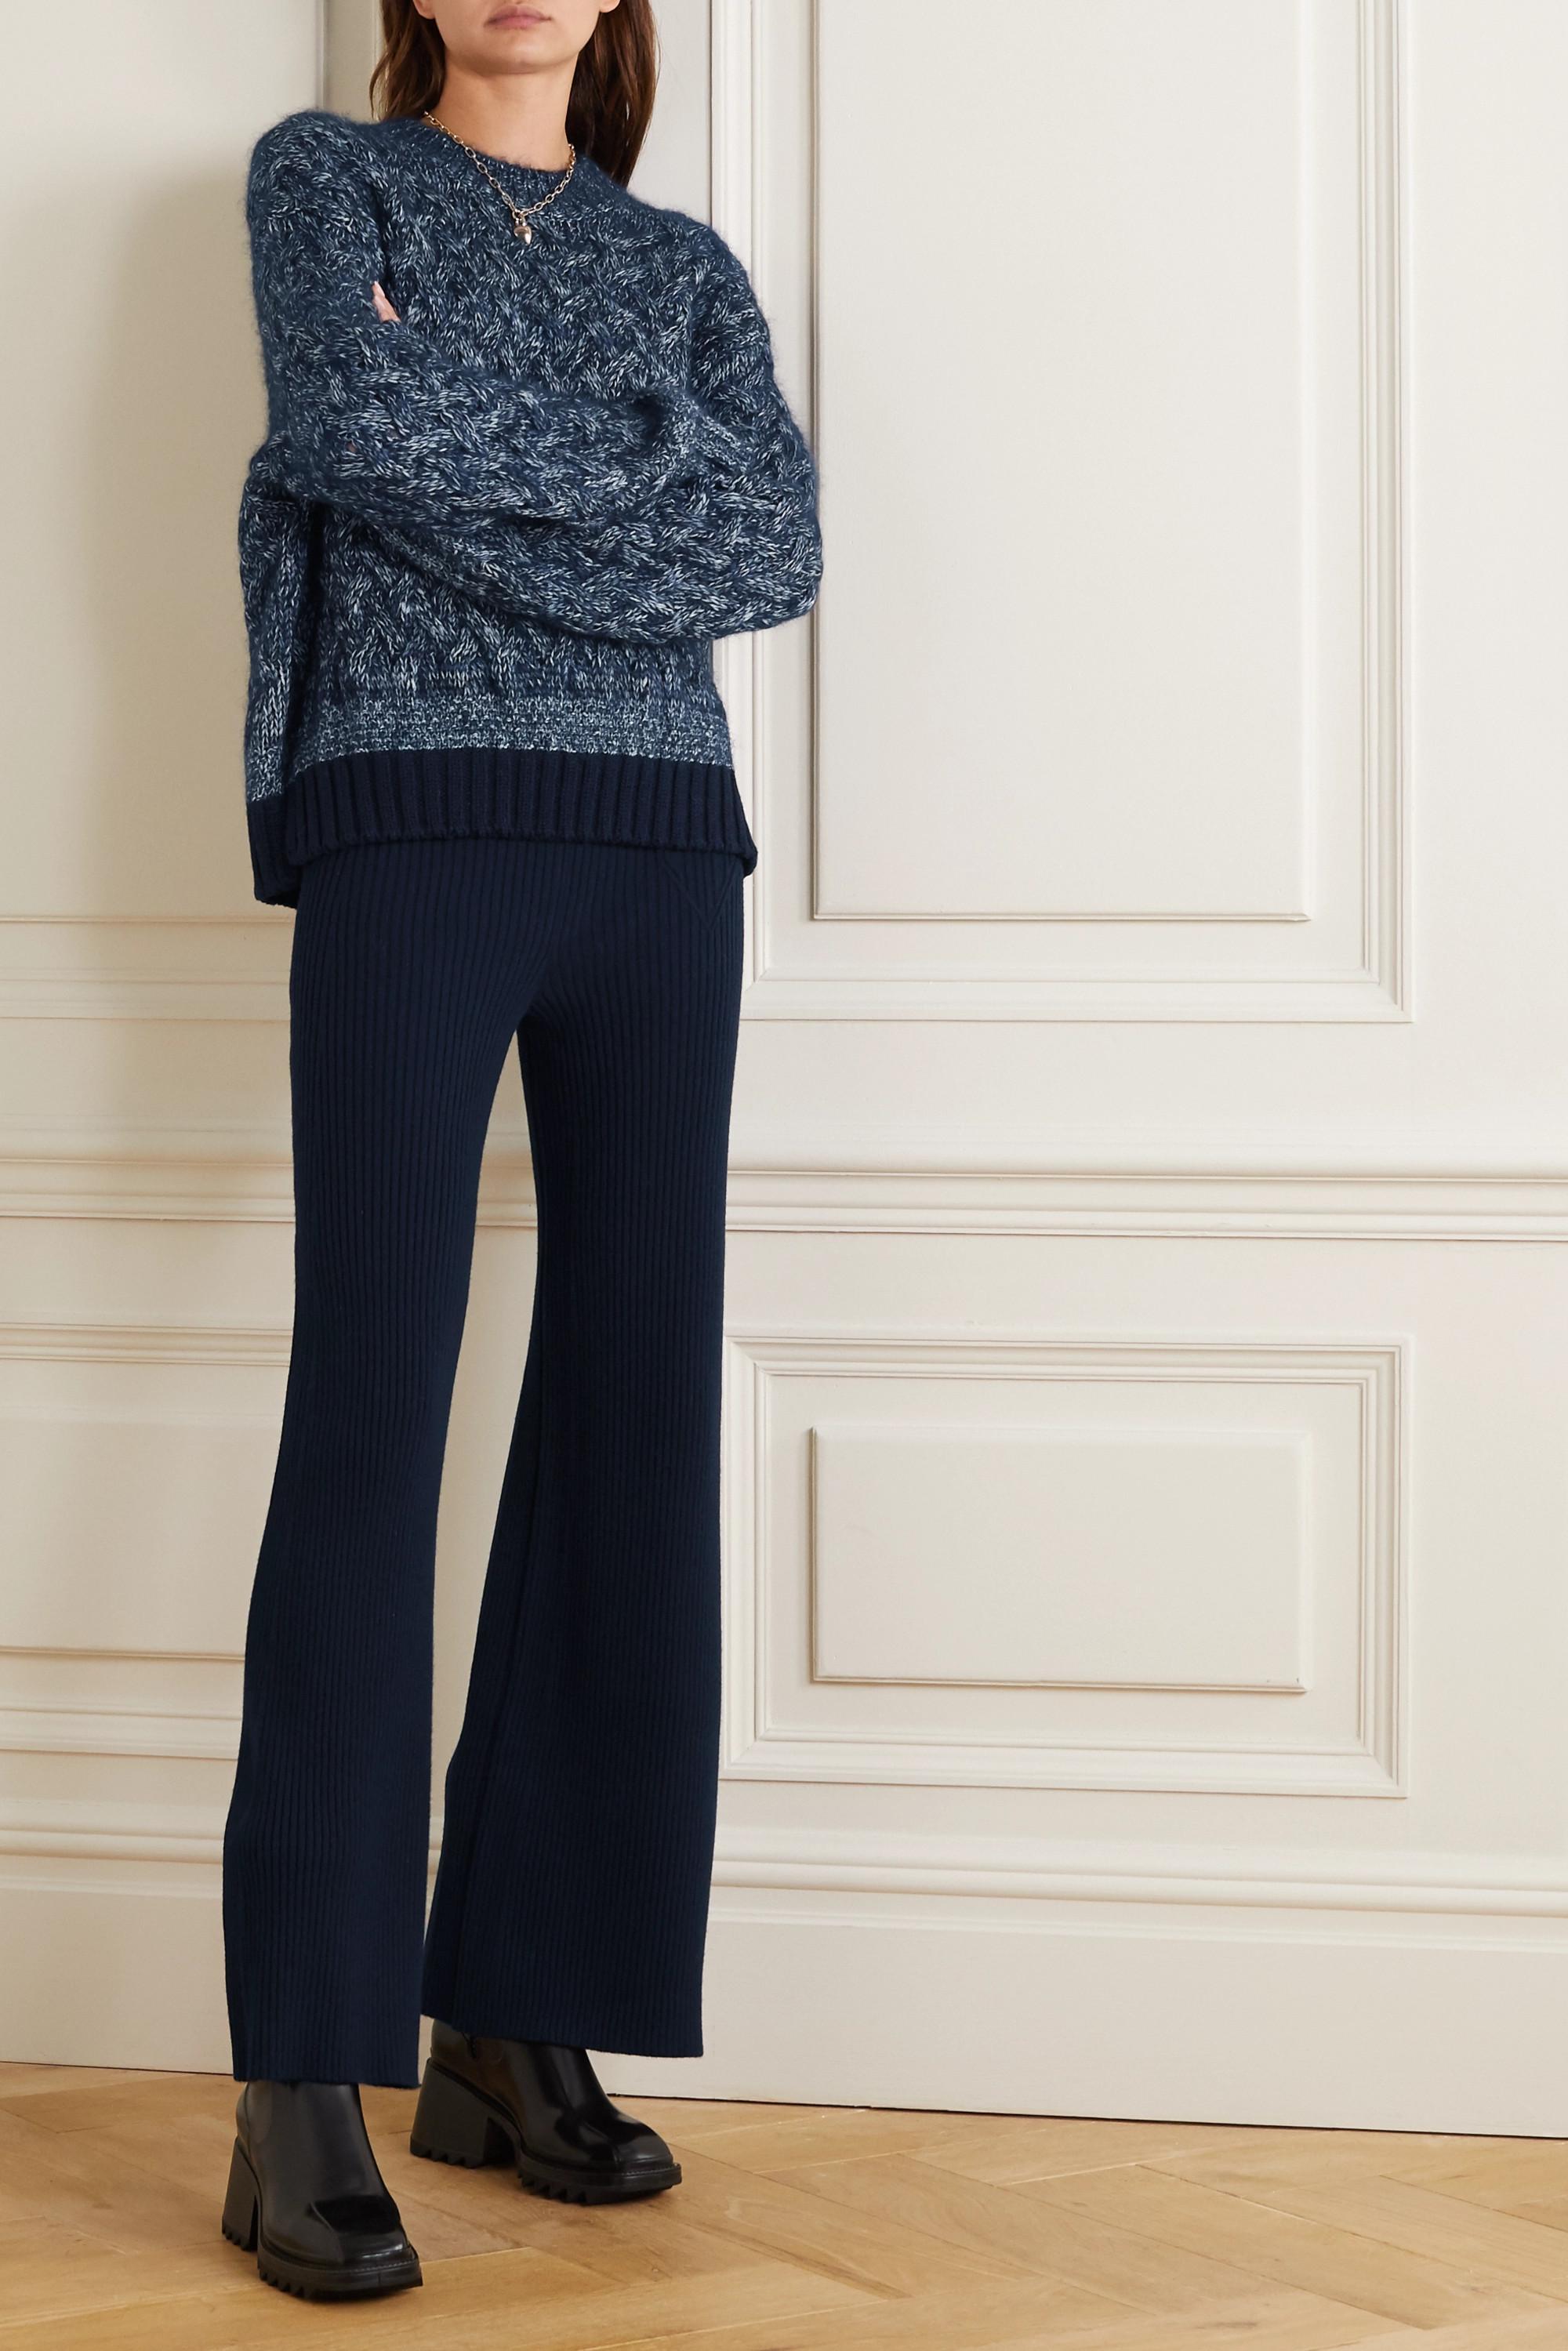 Chloé Cable-knit mélange wool-blend sweater